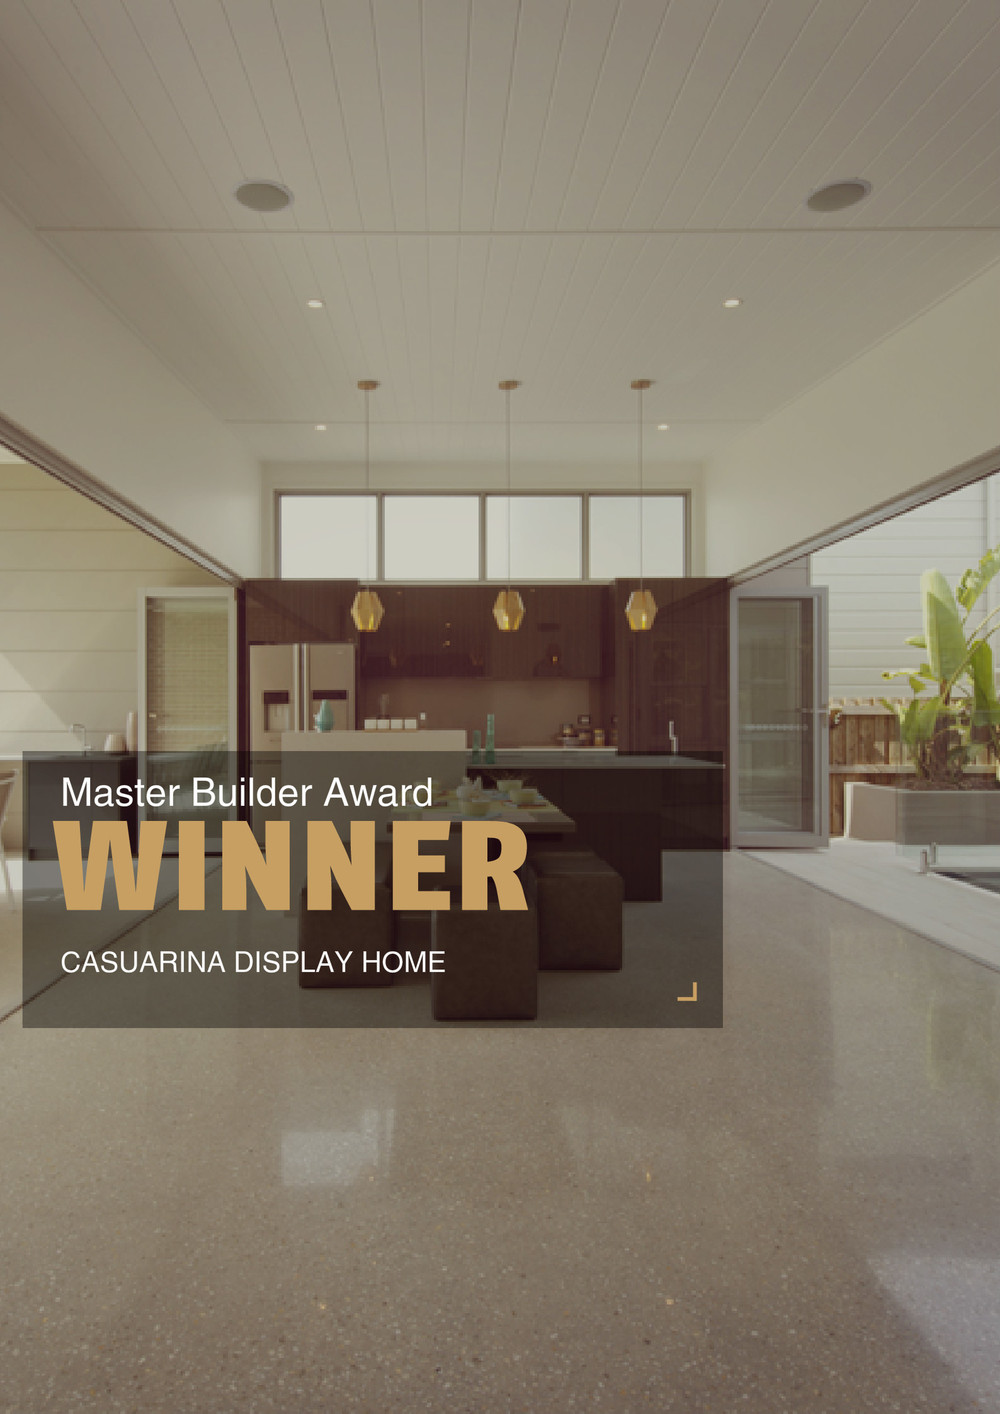 Master Builder Award Winner Display Home.jpg